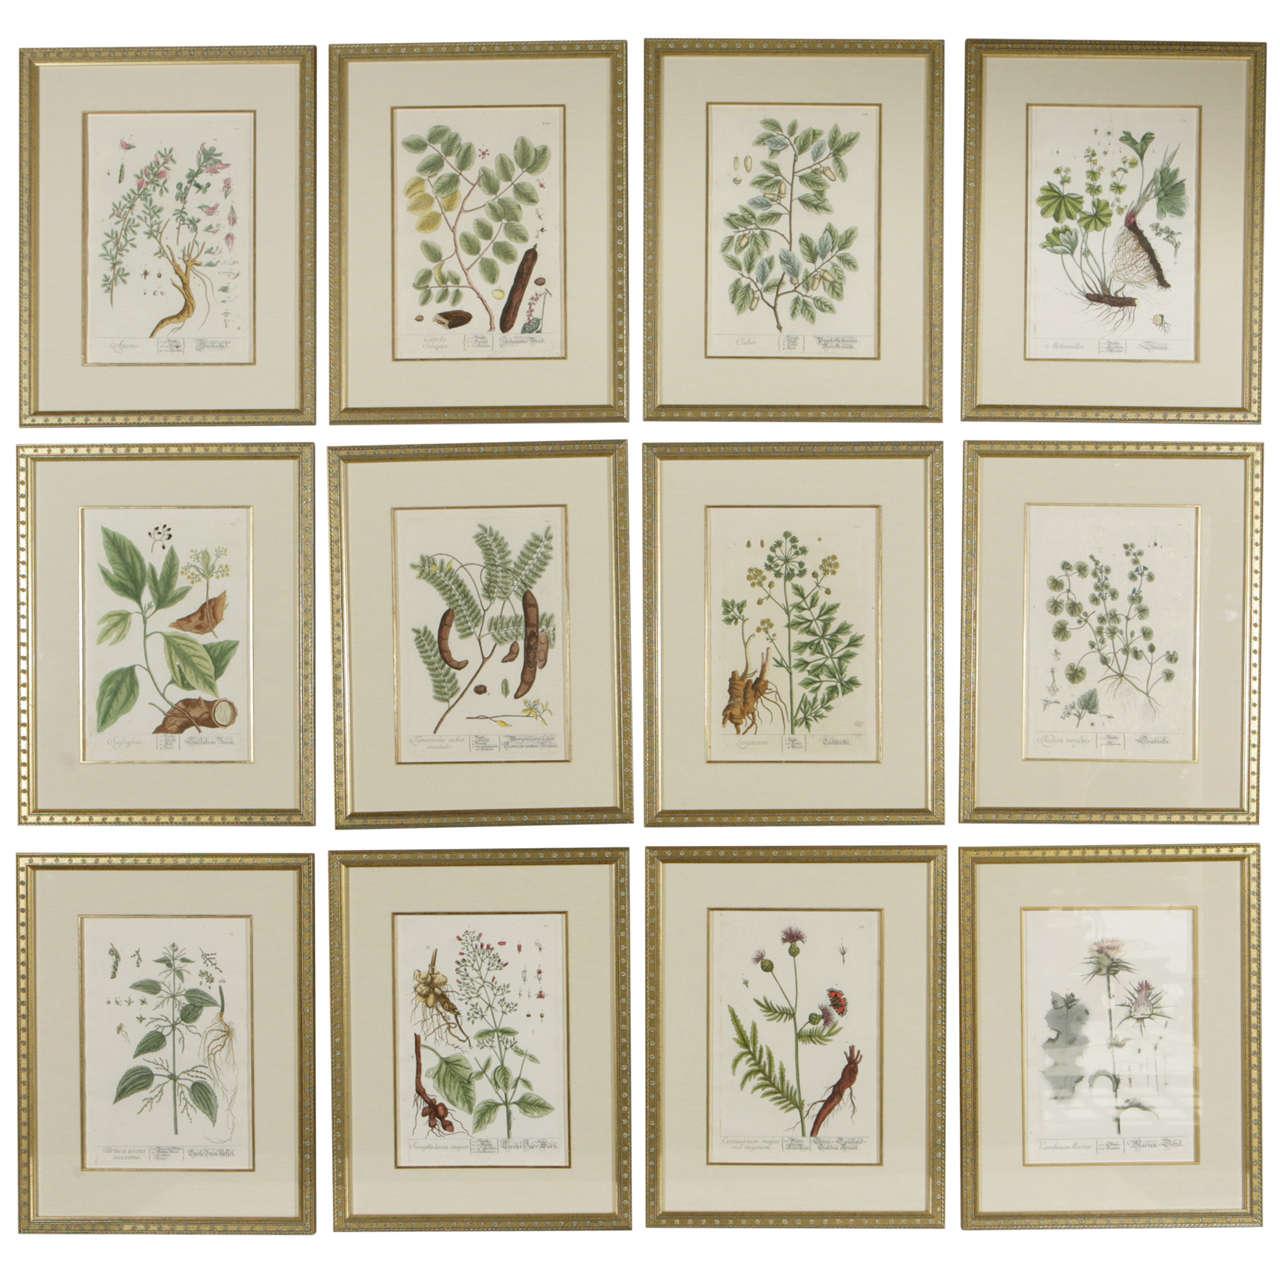 18th century framed botanical prints for sale at 1stdibs for Framed photos for sale